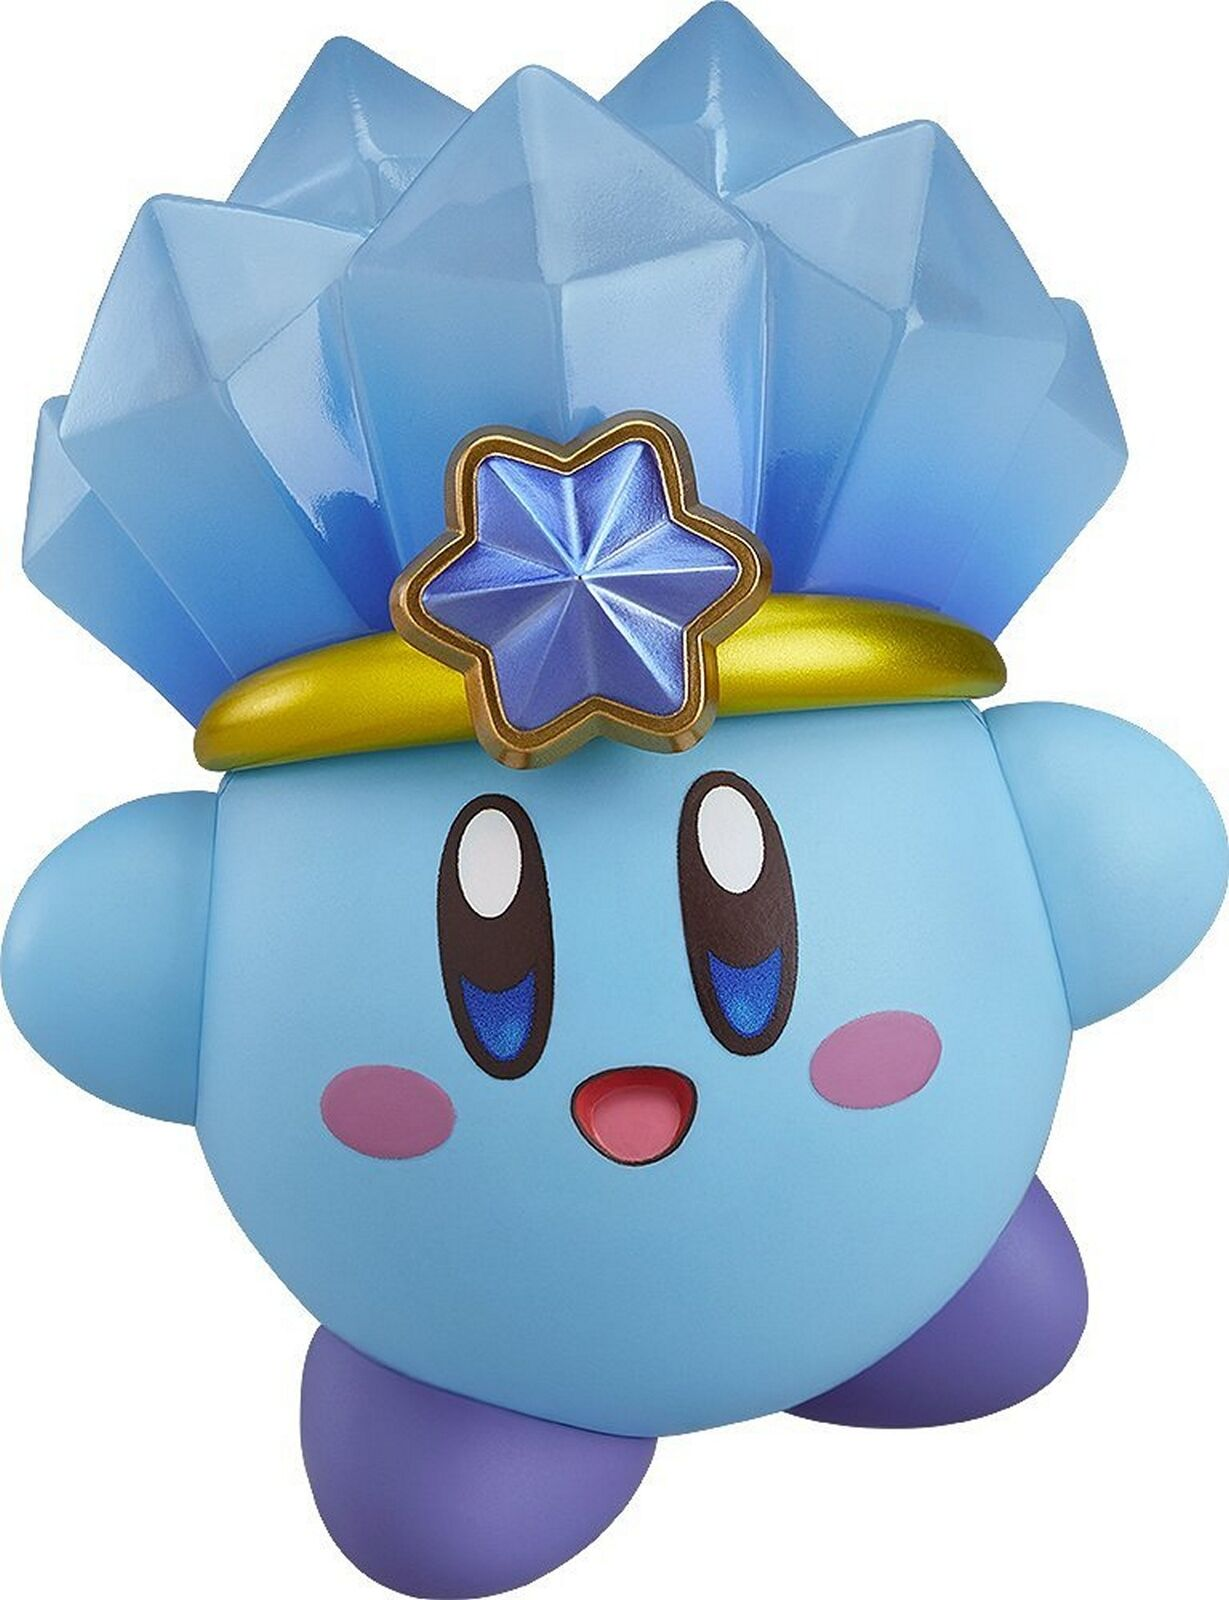 Good Smile Dream Land: Ice Kirby Nendoroid Action Figure